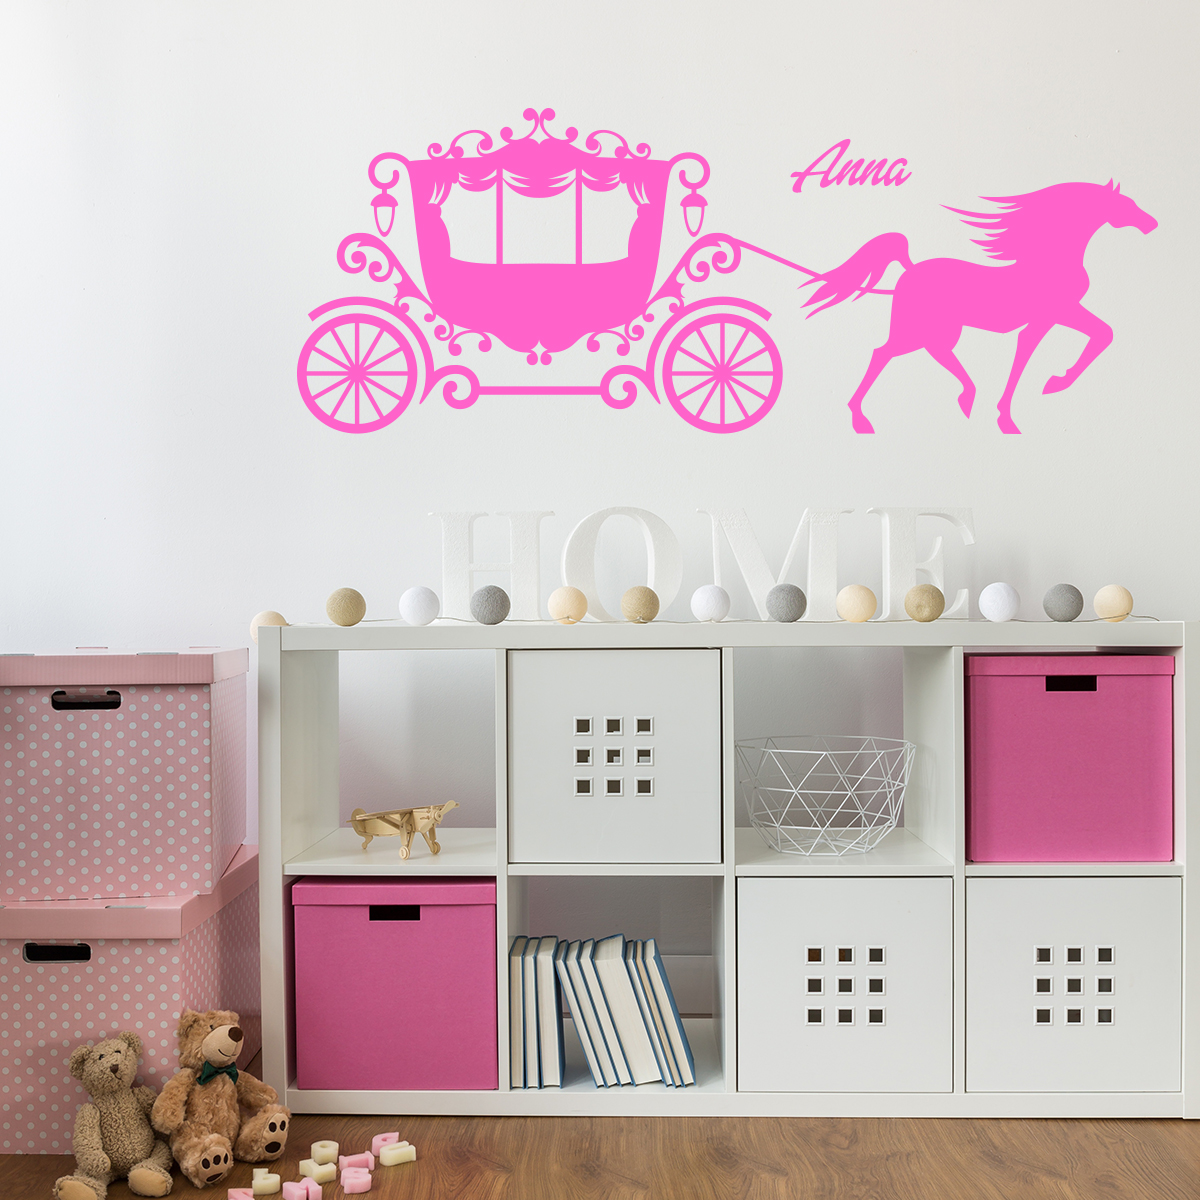 sticker pr nom personnalisable cal che texte. Black Bedroom Furniture Sets. Home Design Ideas